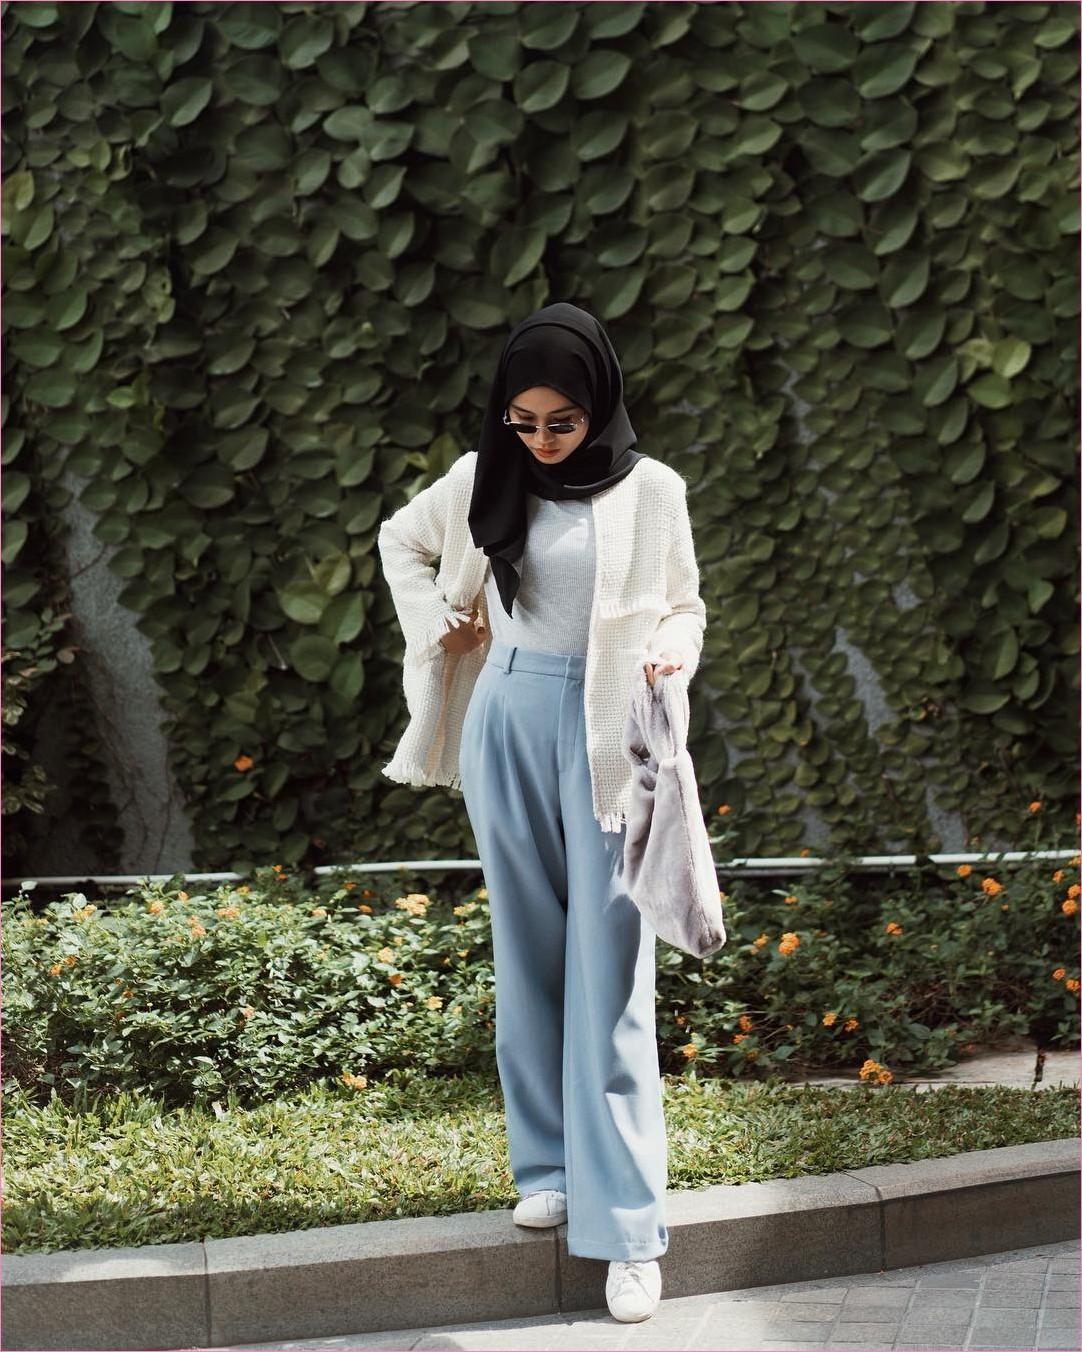 Outfit Kerudung Pashmina Ala Selebgram 2018 hijab pashmina rawis hitam celana kulot pallazo biru pastel t-shirt mangset abu muda cardigan outer blazer putih handbag sneakers kets kacamata bulat ootd trendy kekinian hijabers